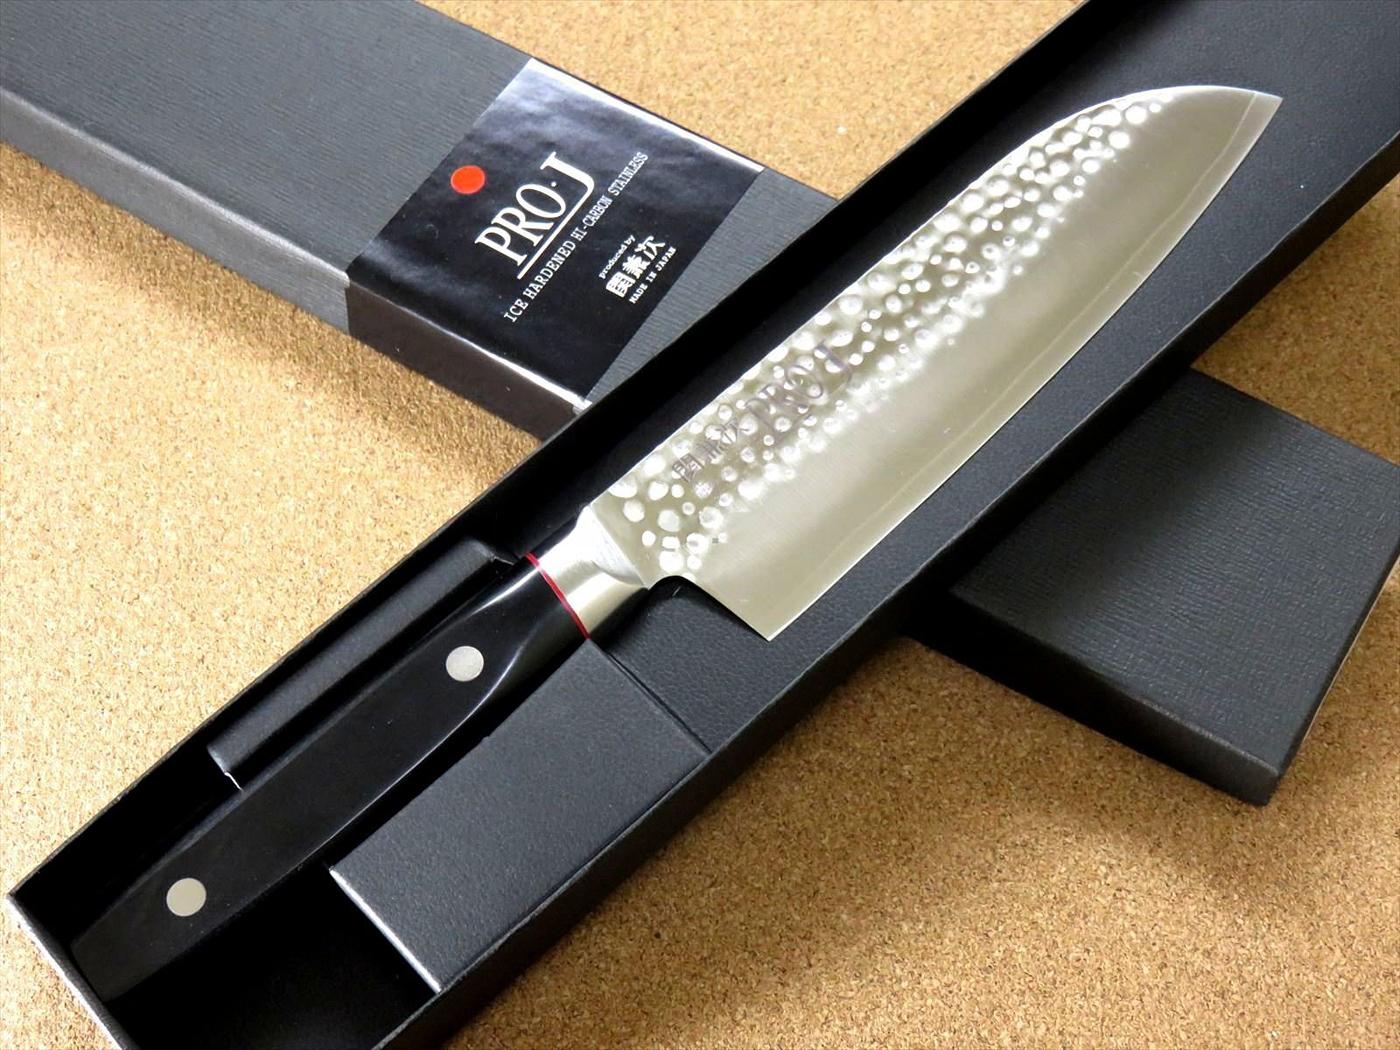 Фото 10 - Кухонный нож Сантоку, Pro-J, Kanetsugu, 6003, сталь VG-10, в картонной коробке